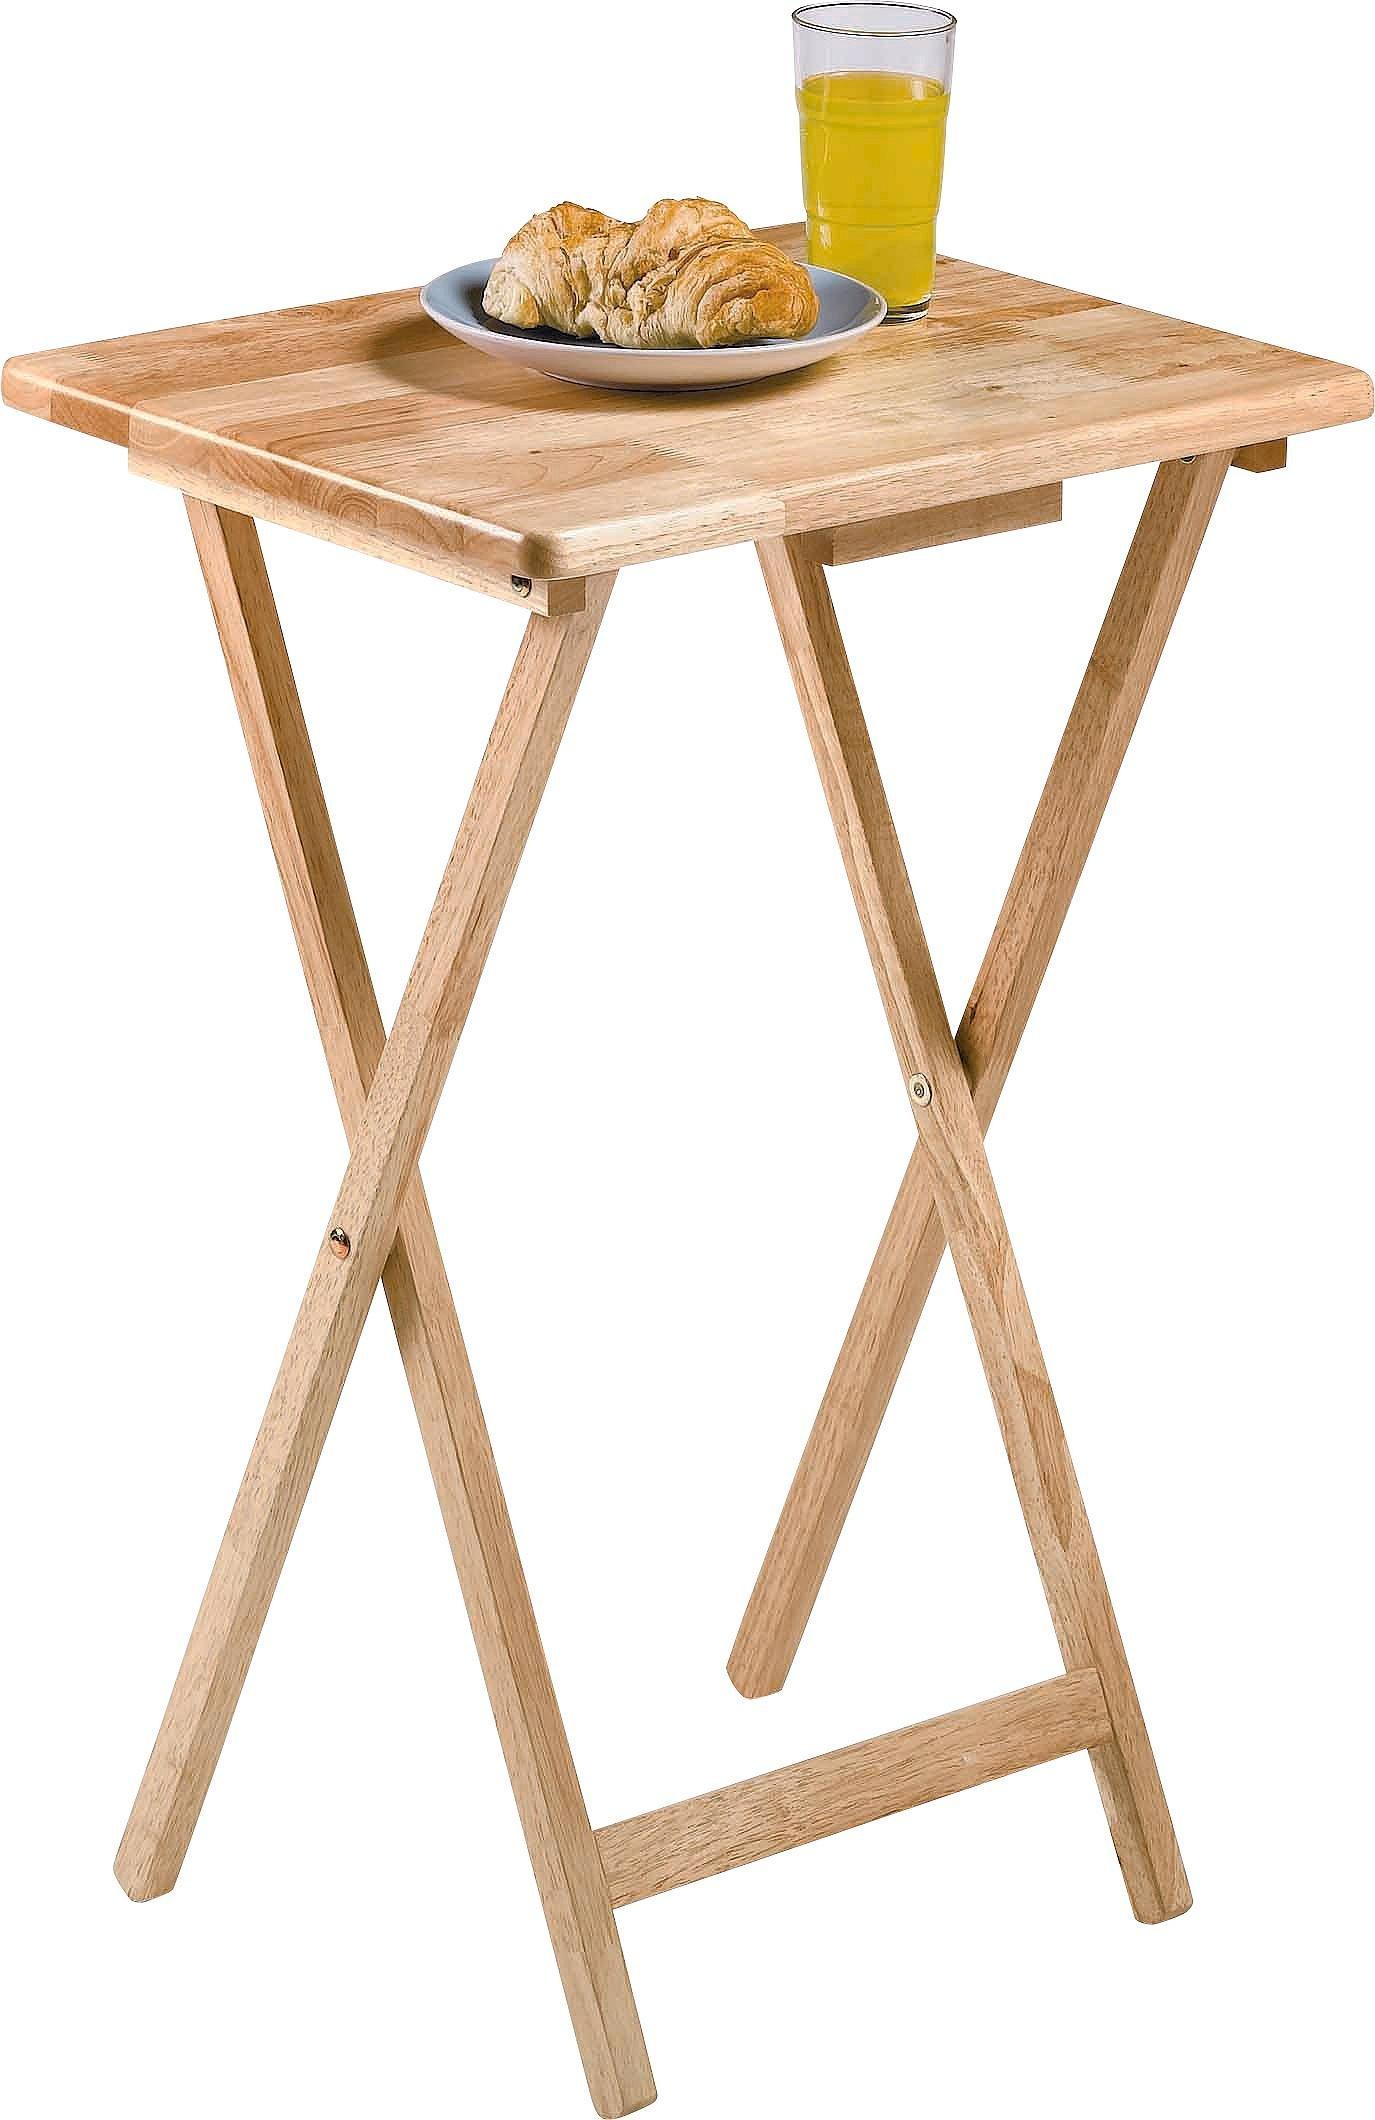 Argos Home Single Folding Tray Table - Natural